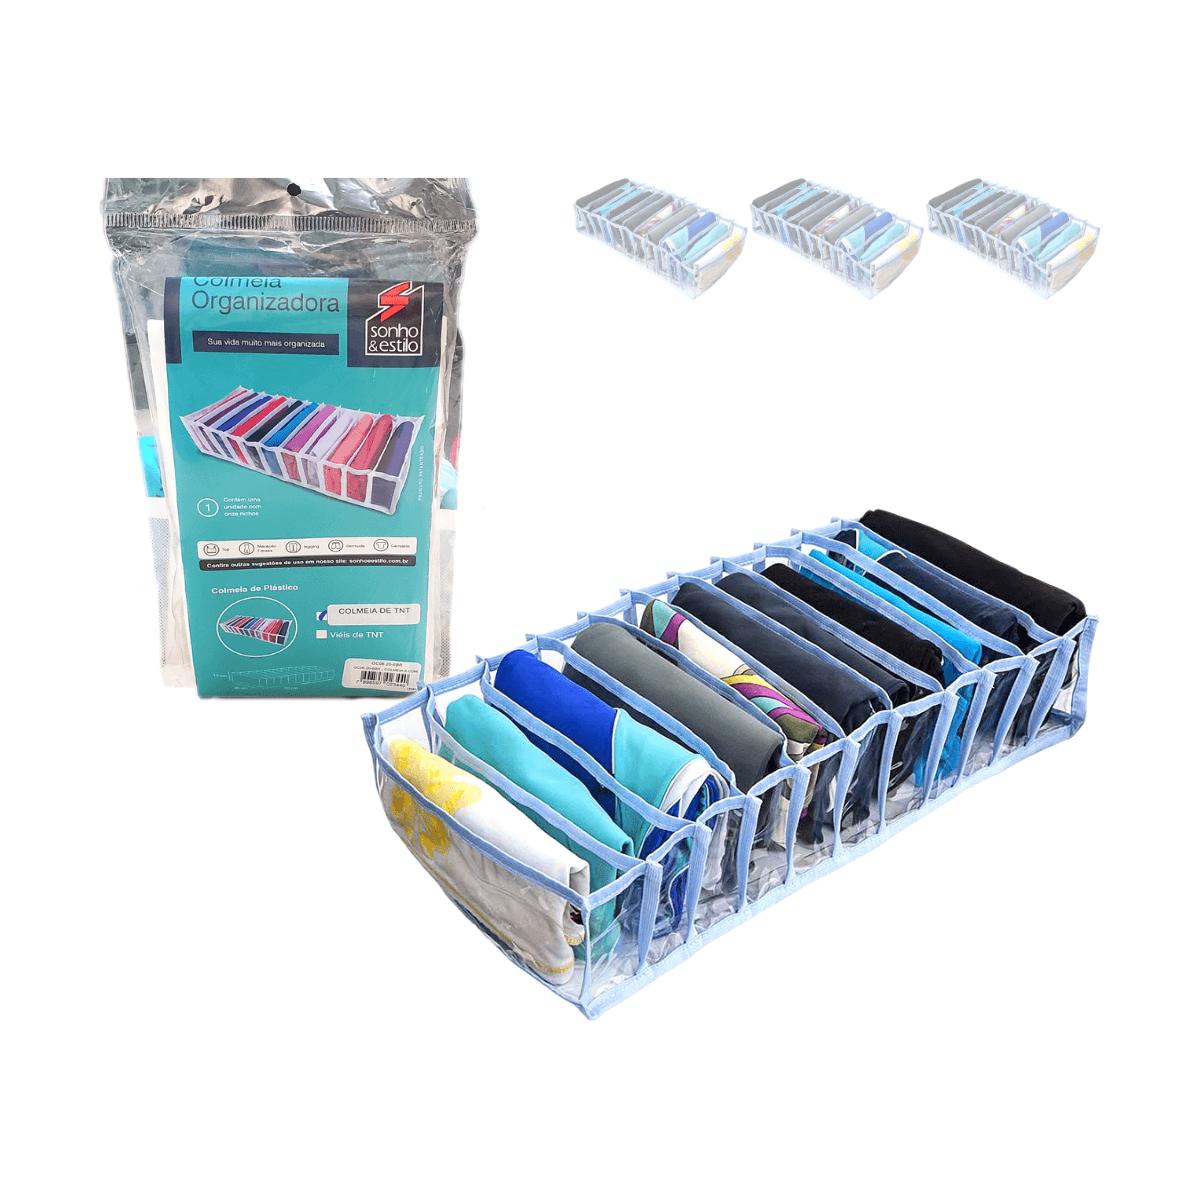 Colmeia Organizadora De Gaveta 11 Nichos Azul V.TNT 20x50x10cm Kit 3Un